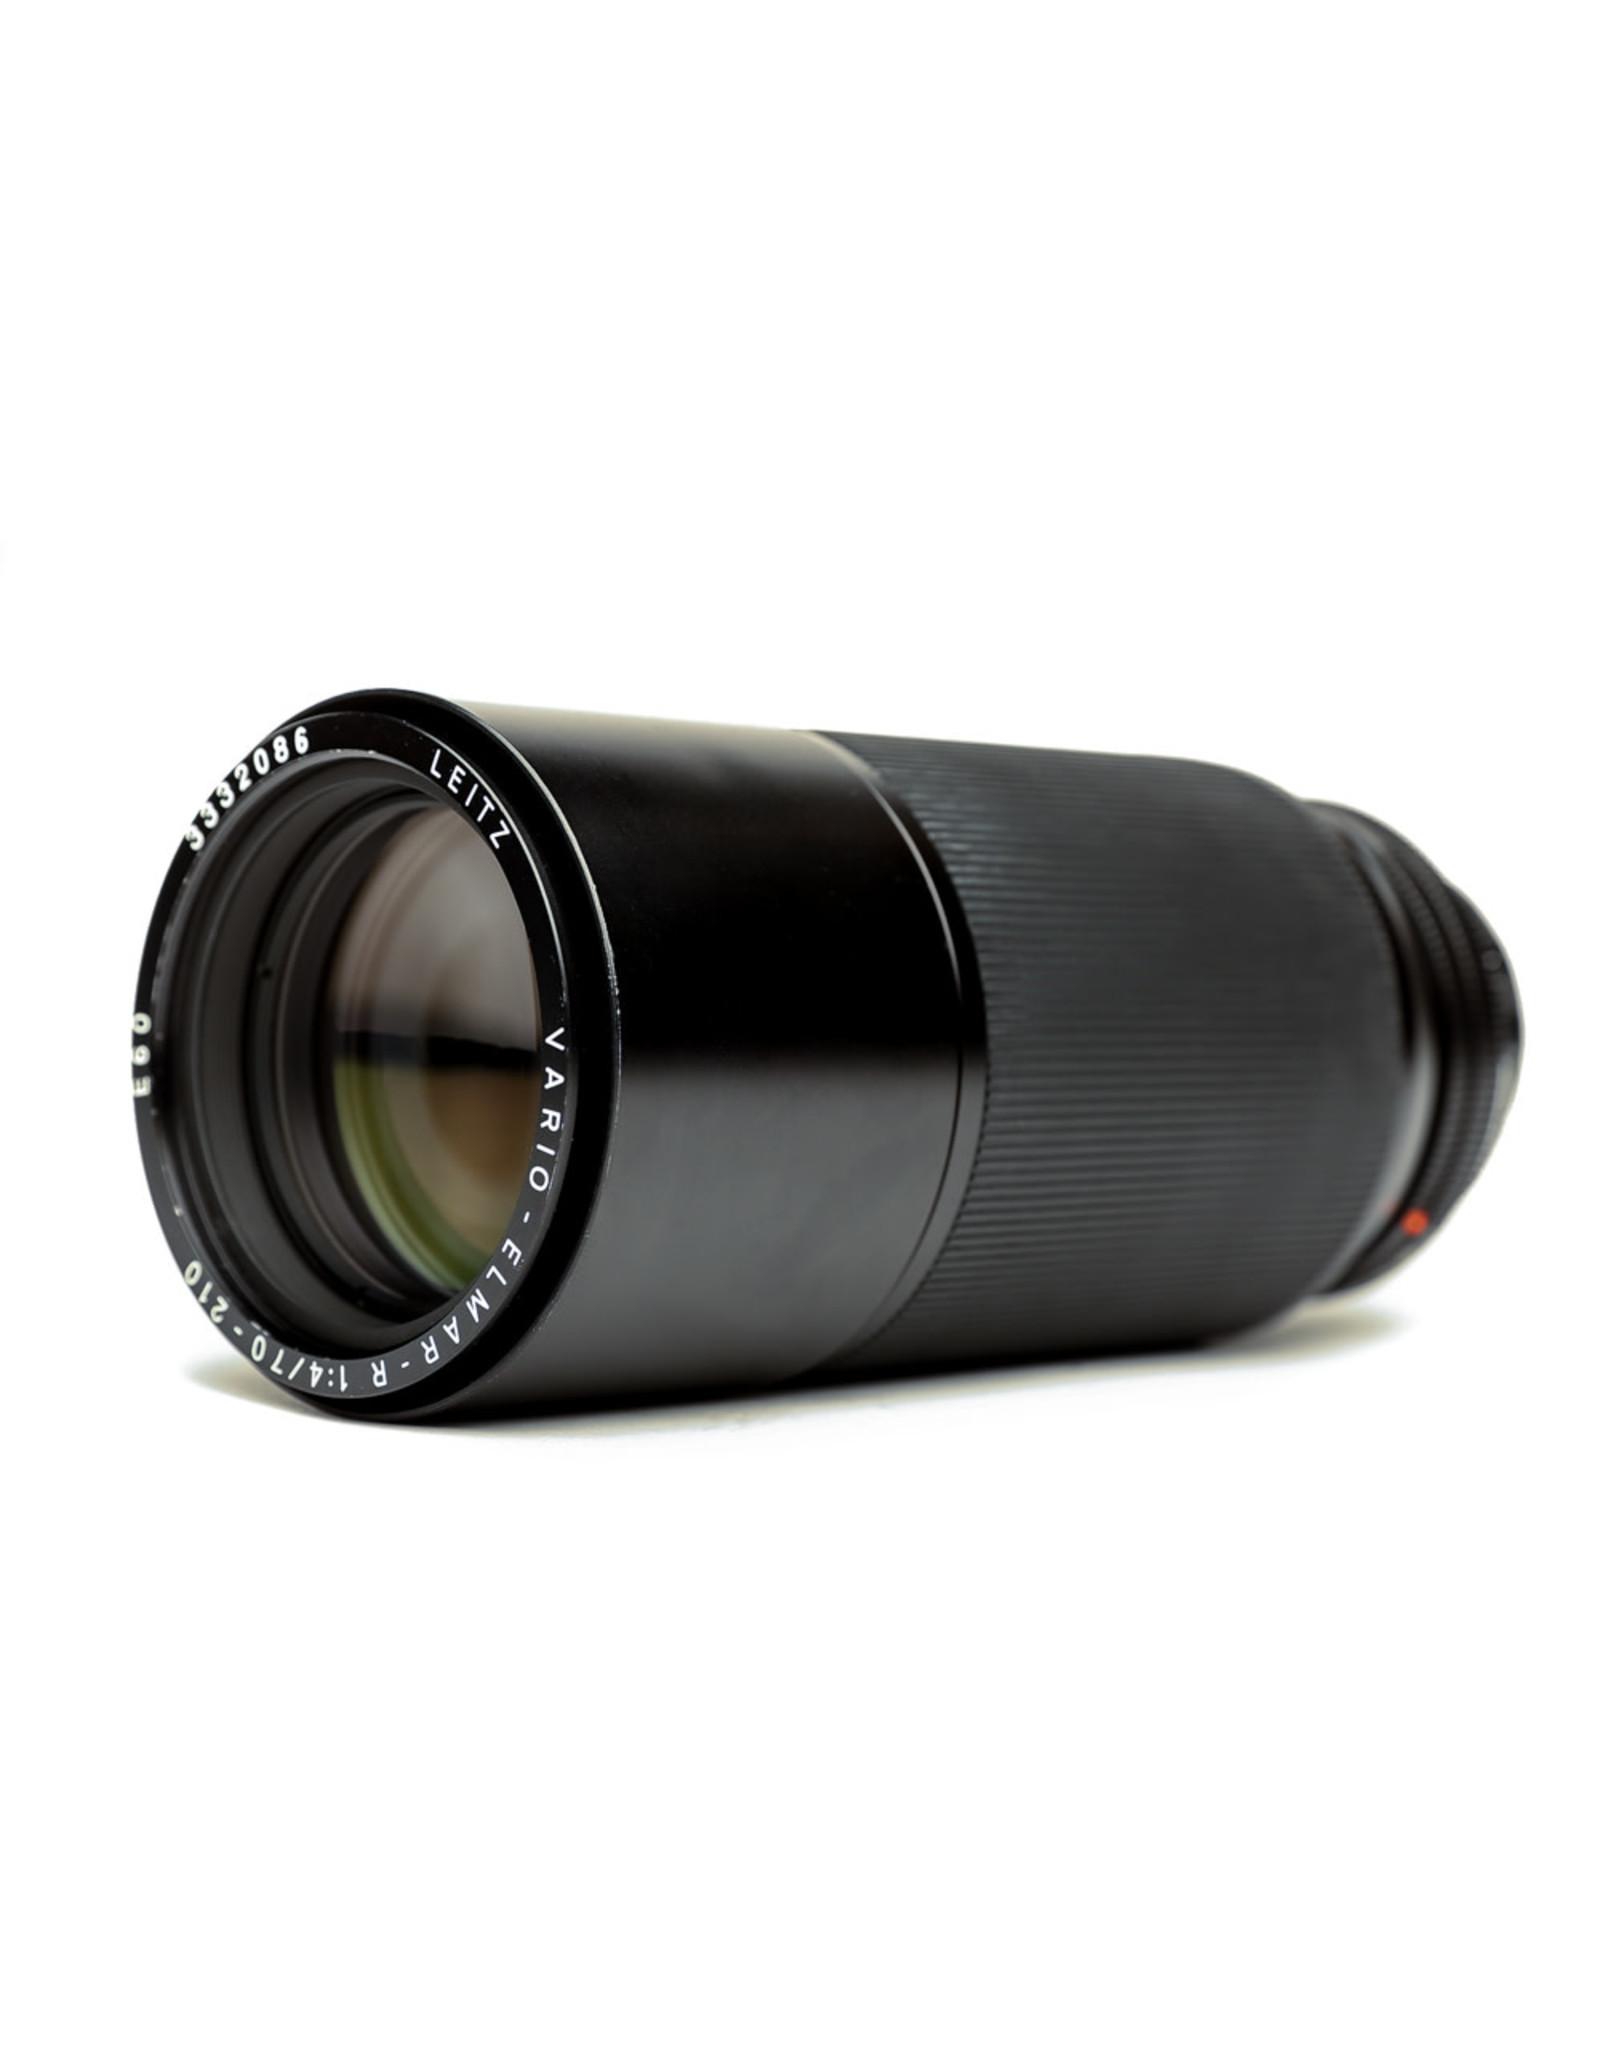 Leica Leica Vario-Elmar 70-210mm f/4 Lens w/case